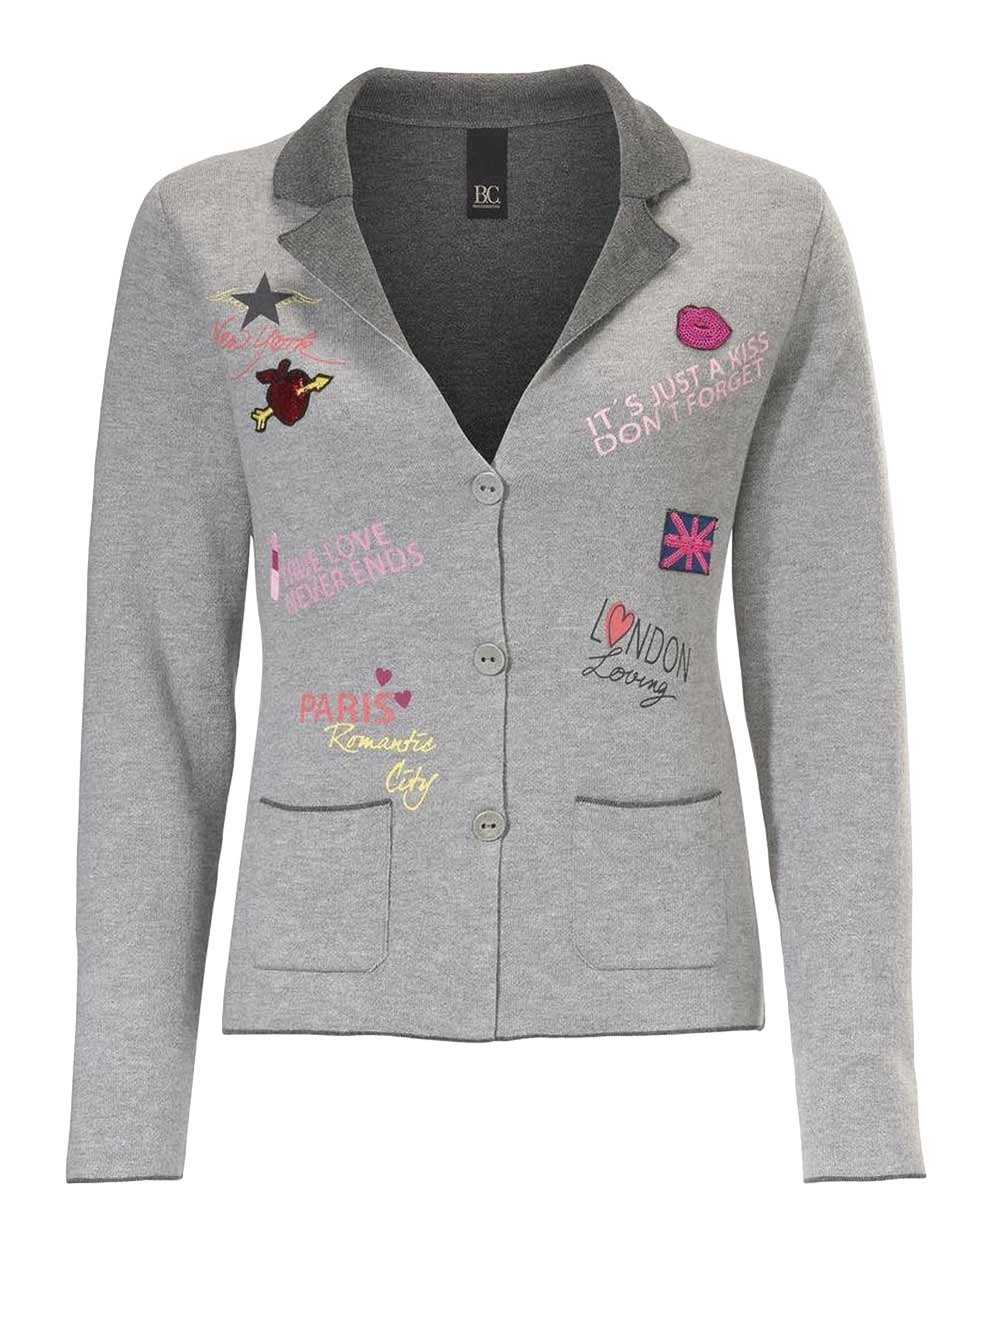 061.676 HEINE Damen Designer-Cardigan m. Patches Grau